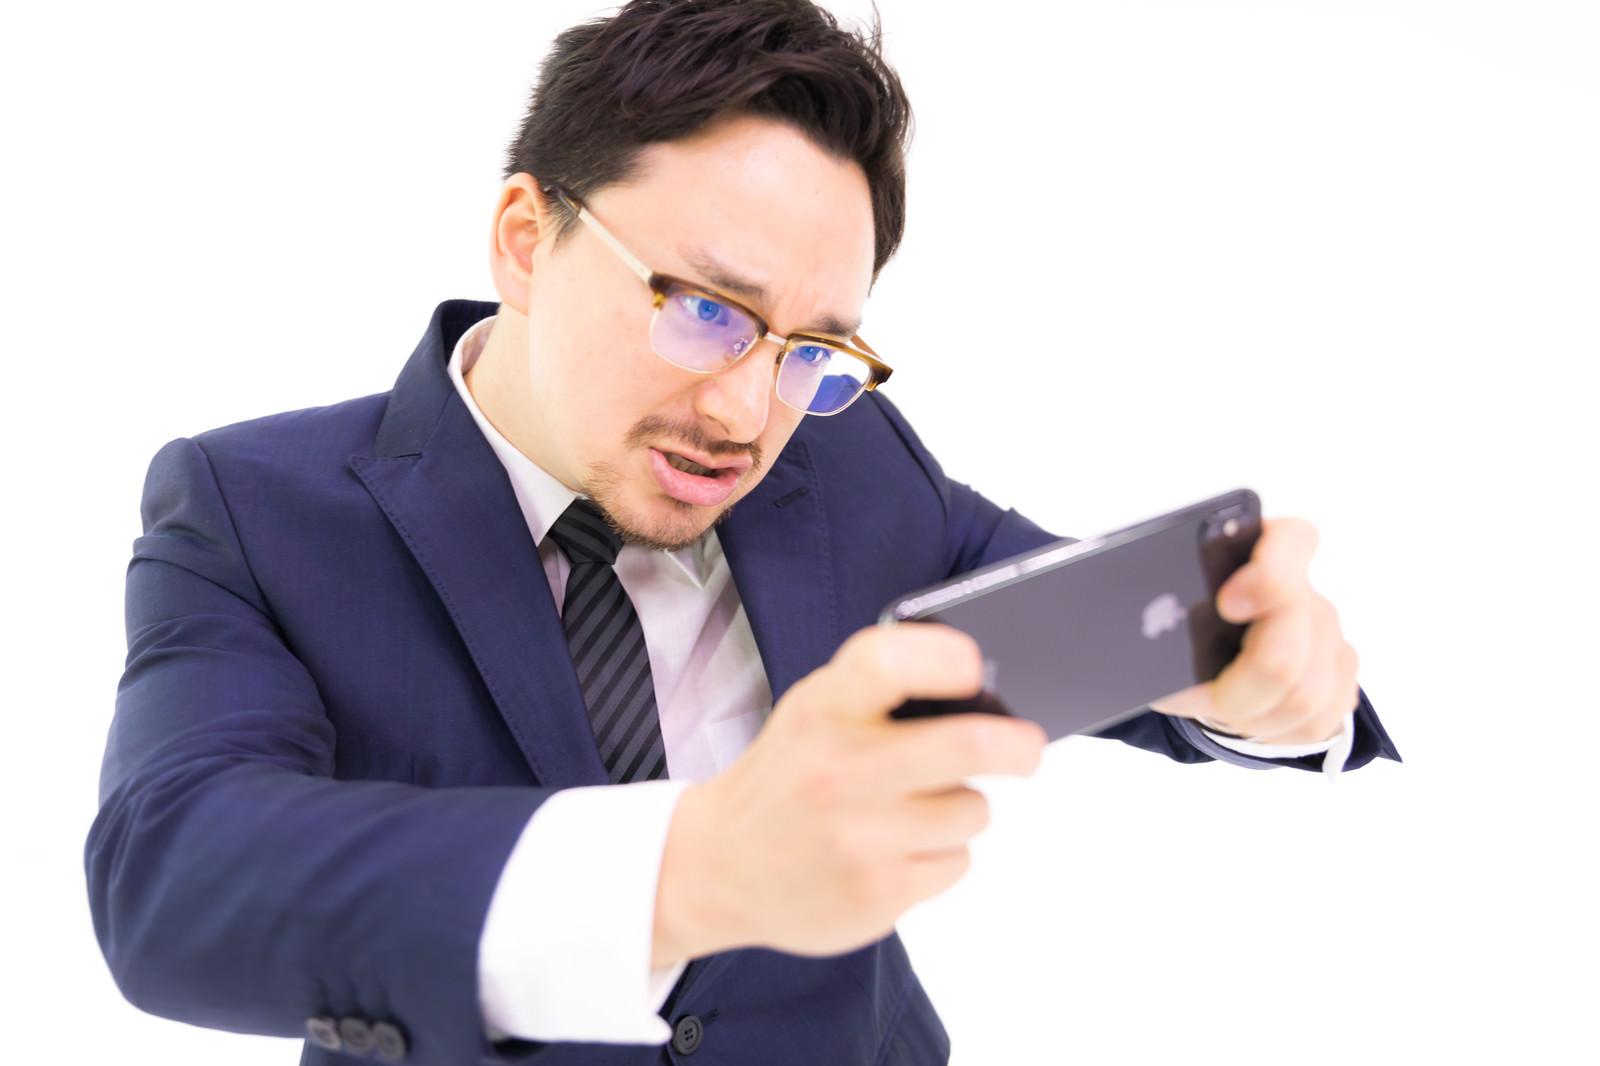 「iPhone XS Maxでレースゲームをプレイする会社員」の写真[モデル:Max_Ezaki]